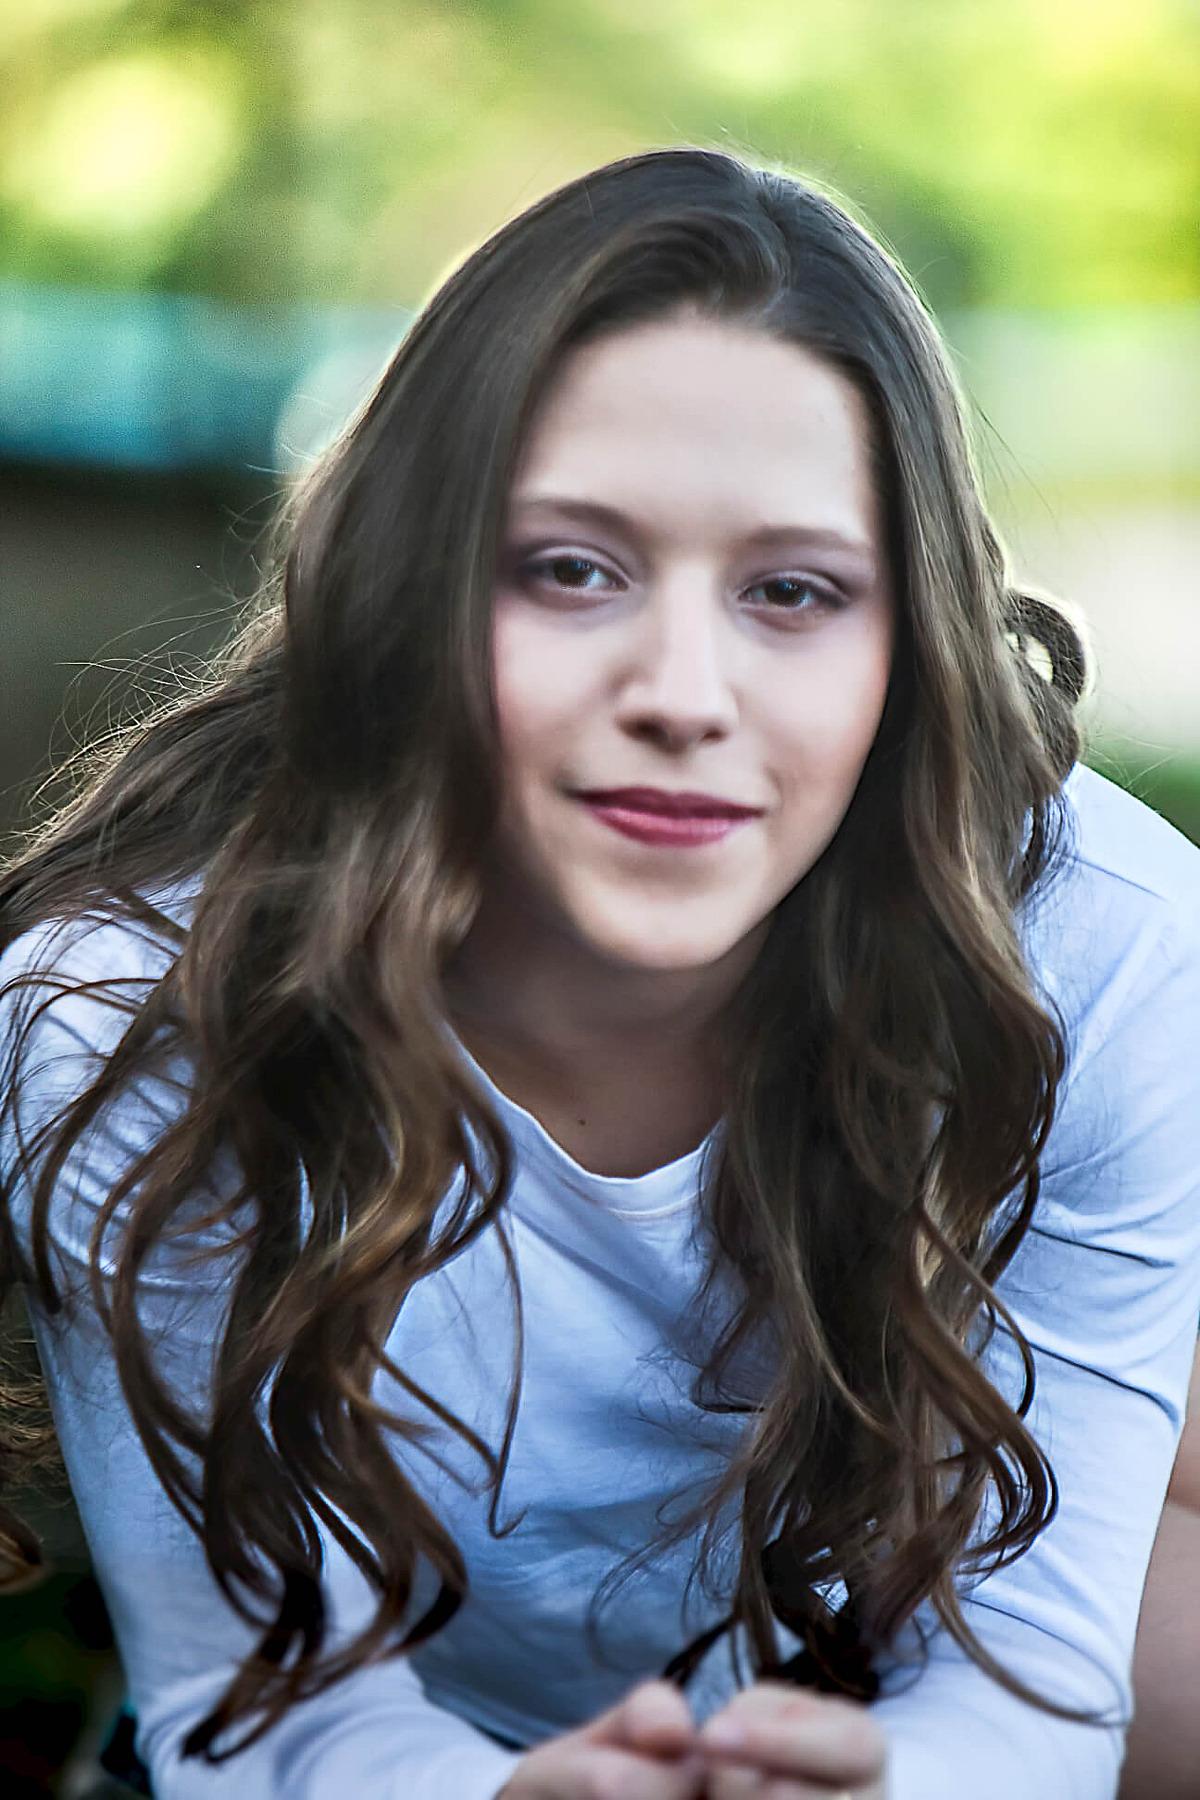 foto-ensaio-15-anos-campinas-sao-paulo-sp